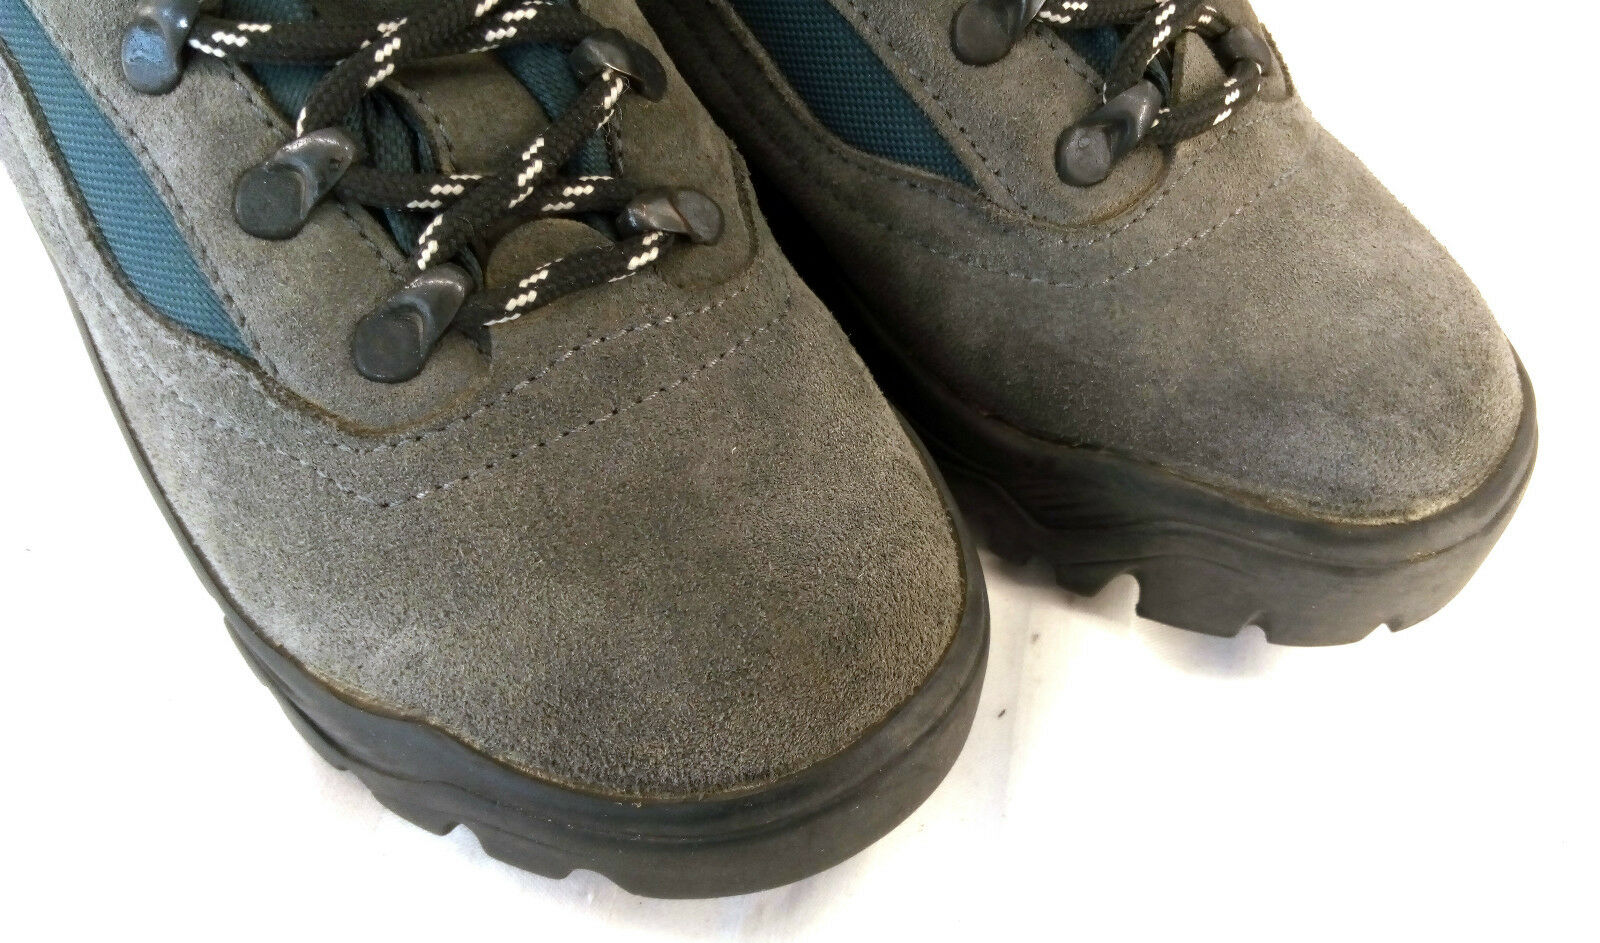 McKinley Aquamax Outdoor Boots Wanderstiefel Grau-Blau Wildleder Gr. 40 TOP